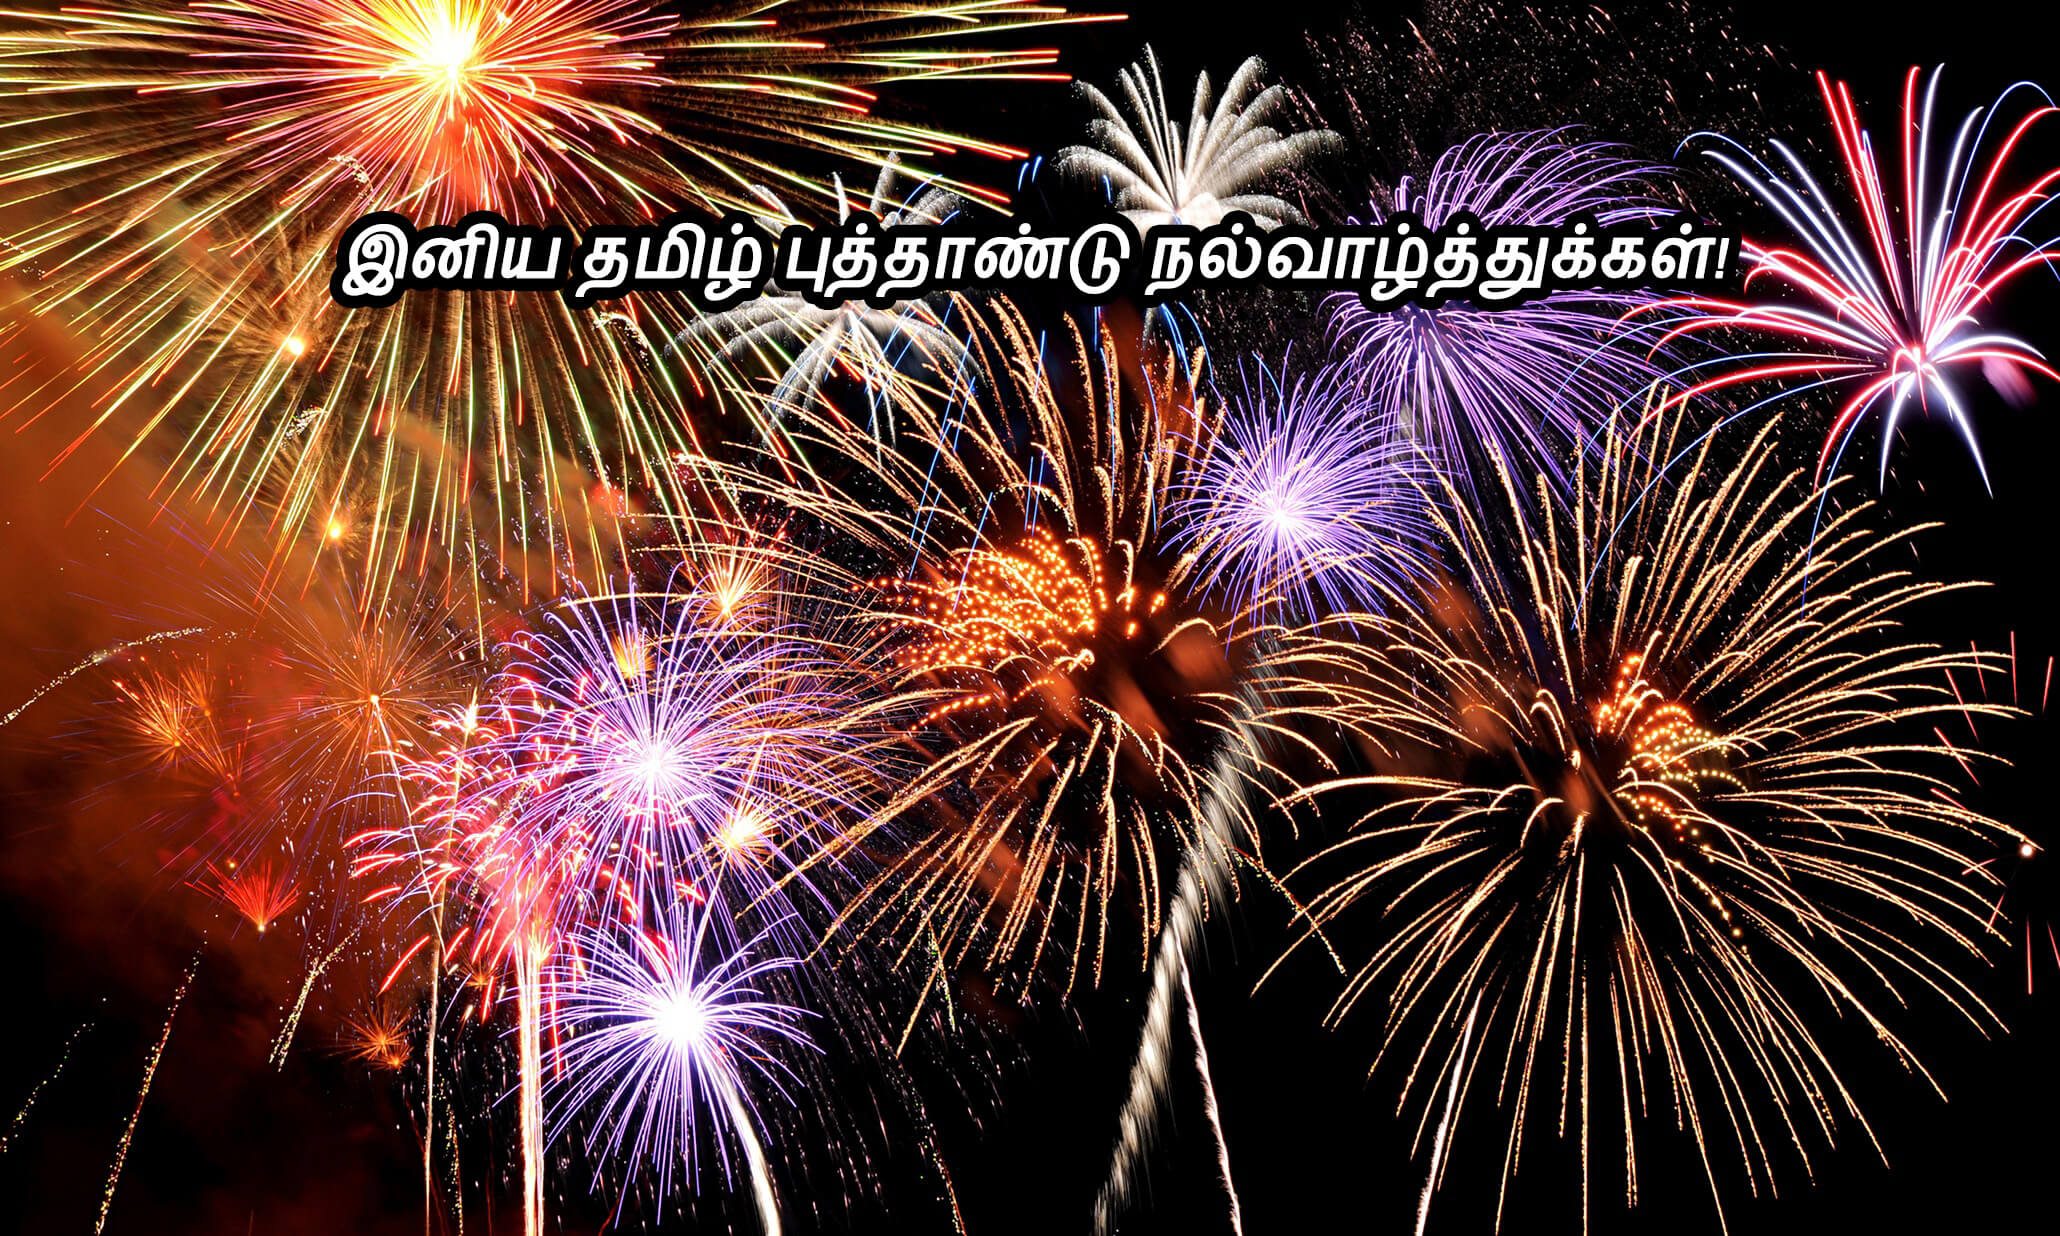 happy tamil new year wishes puthaandu fireworks hd wallpaper